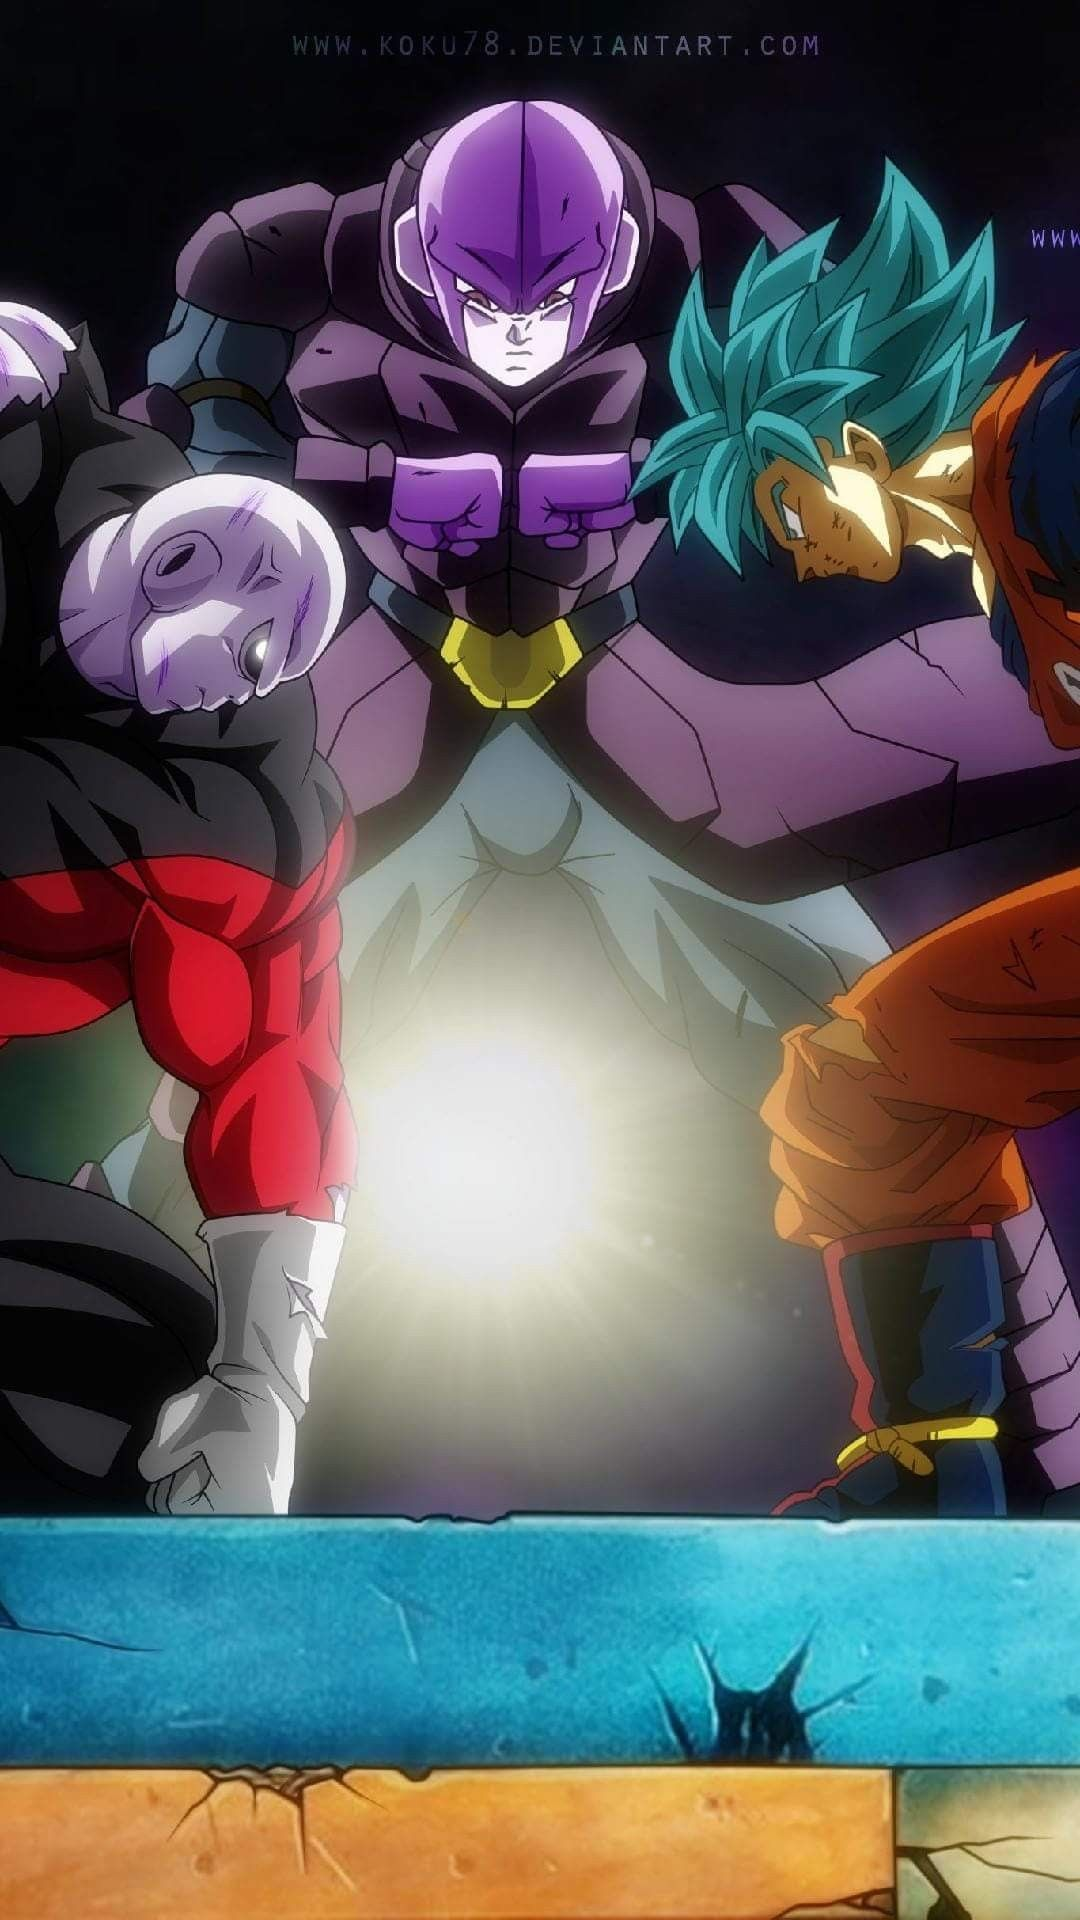 Jiren Hit And Goku Dragones Fondos De Pantalla Goku Y Dragon Ball